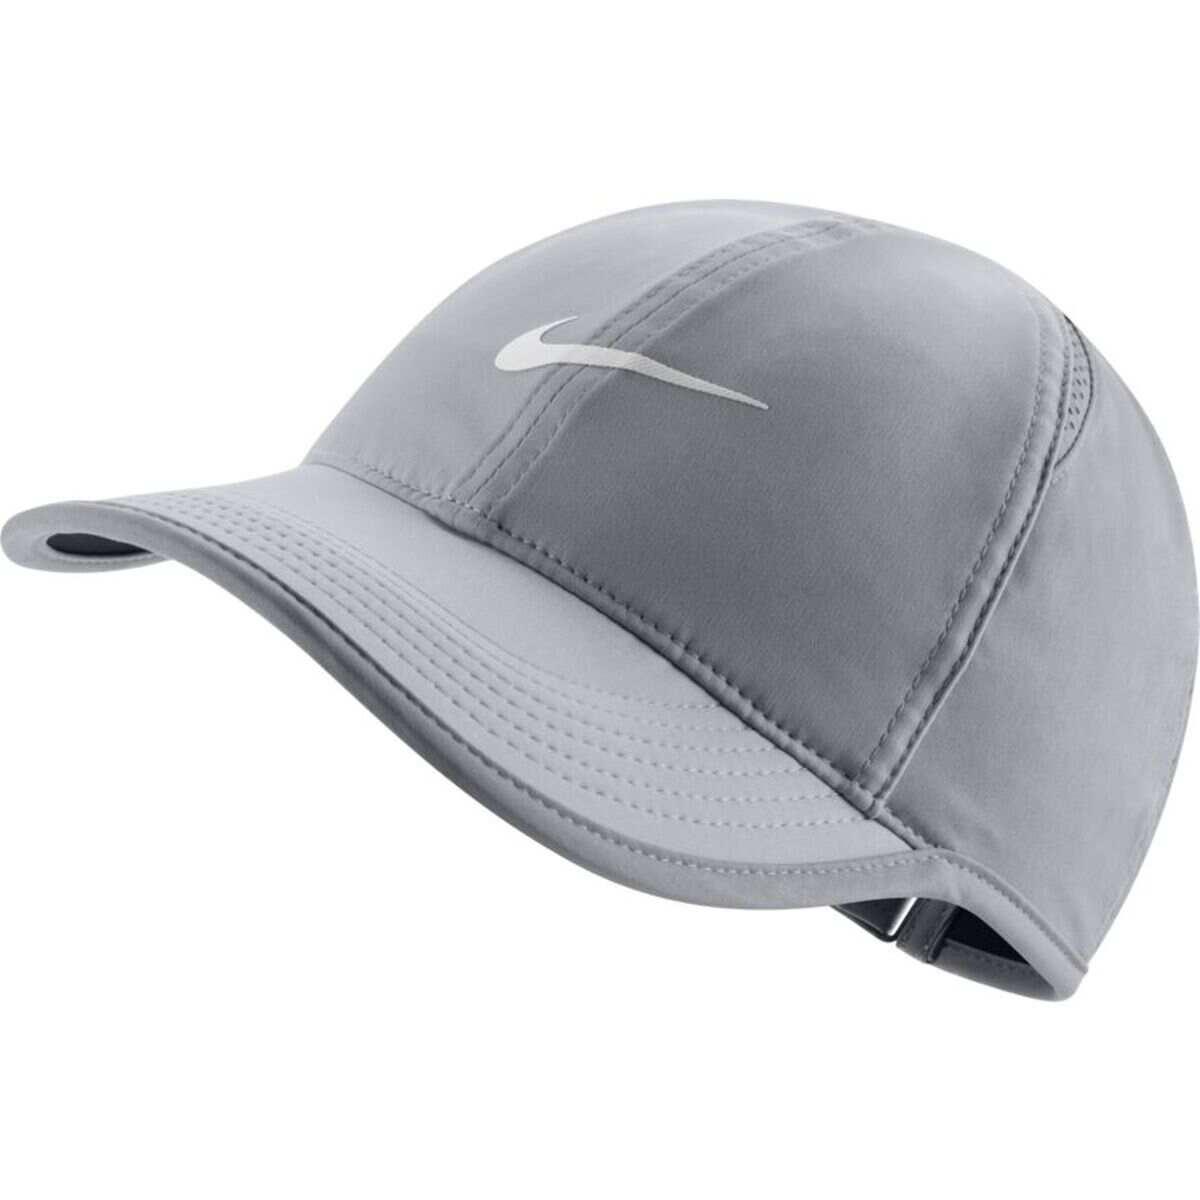 Nike Featherlight Running Cap - GY